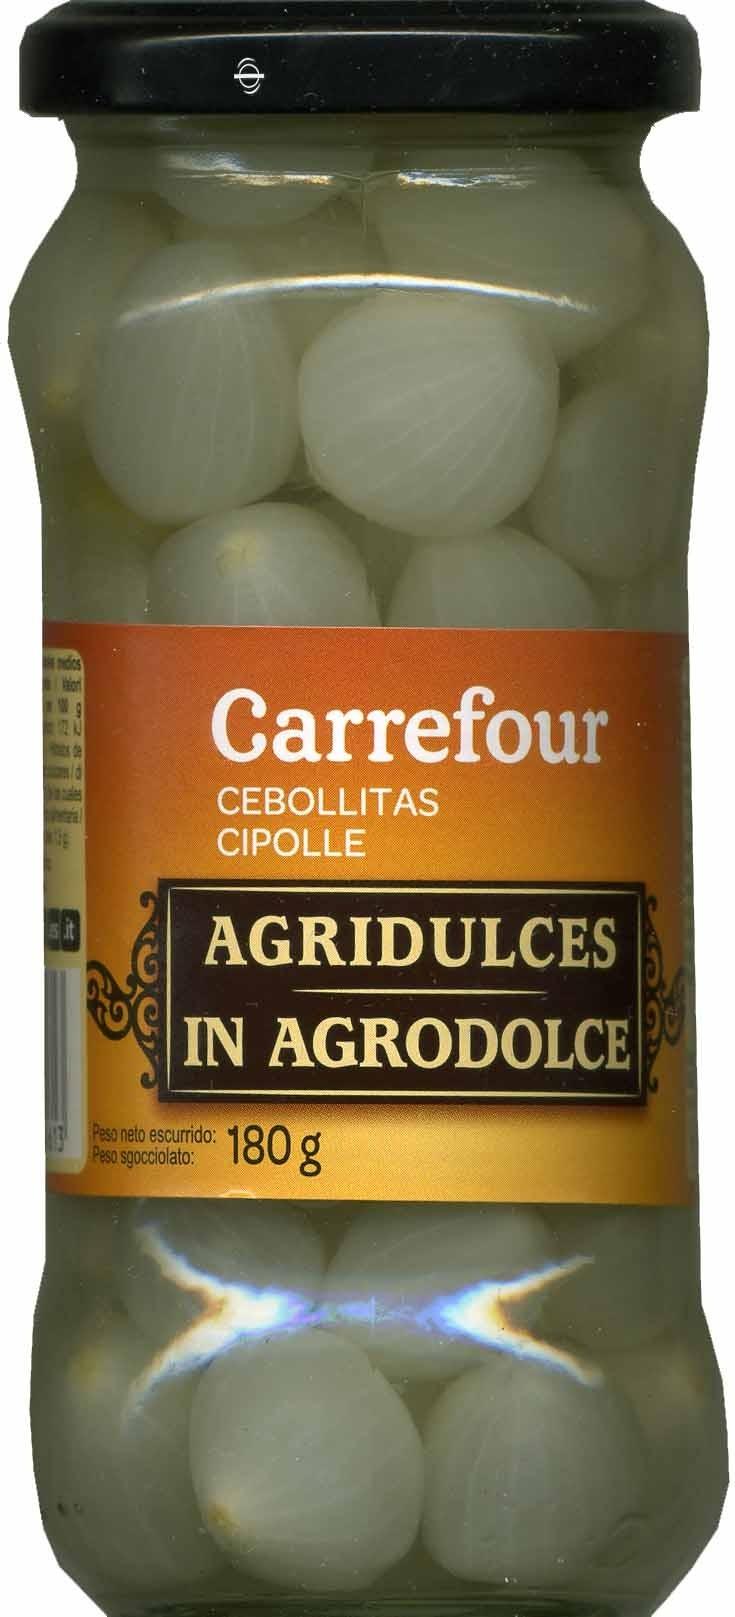 Cebollitas agridulces - Producto